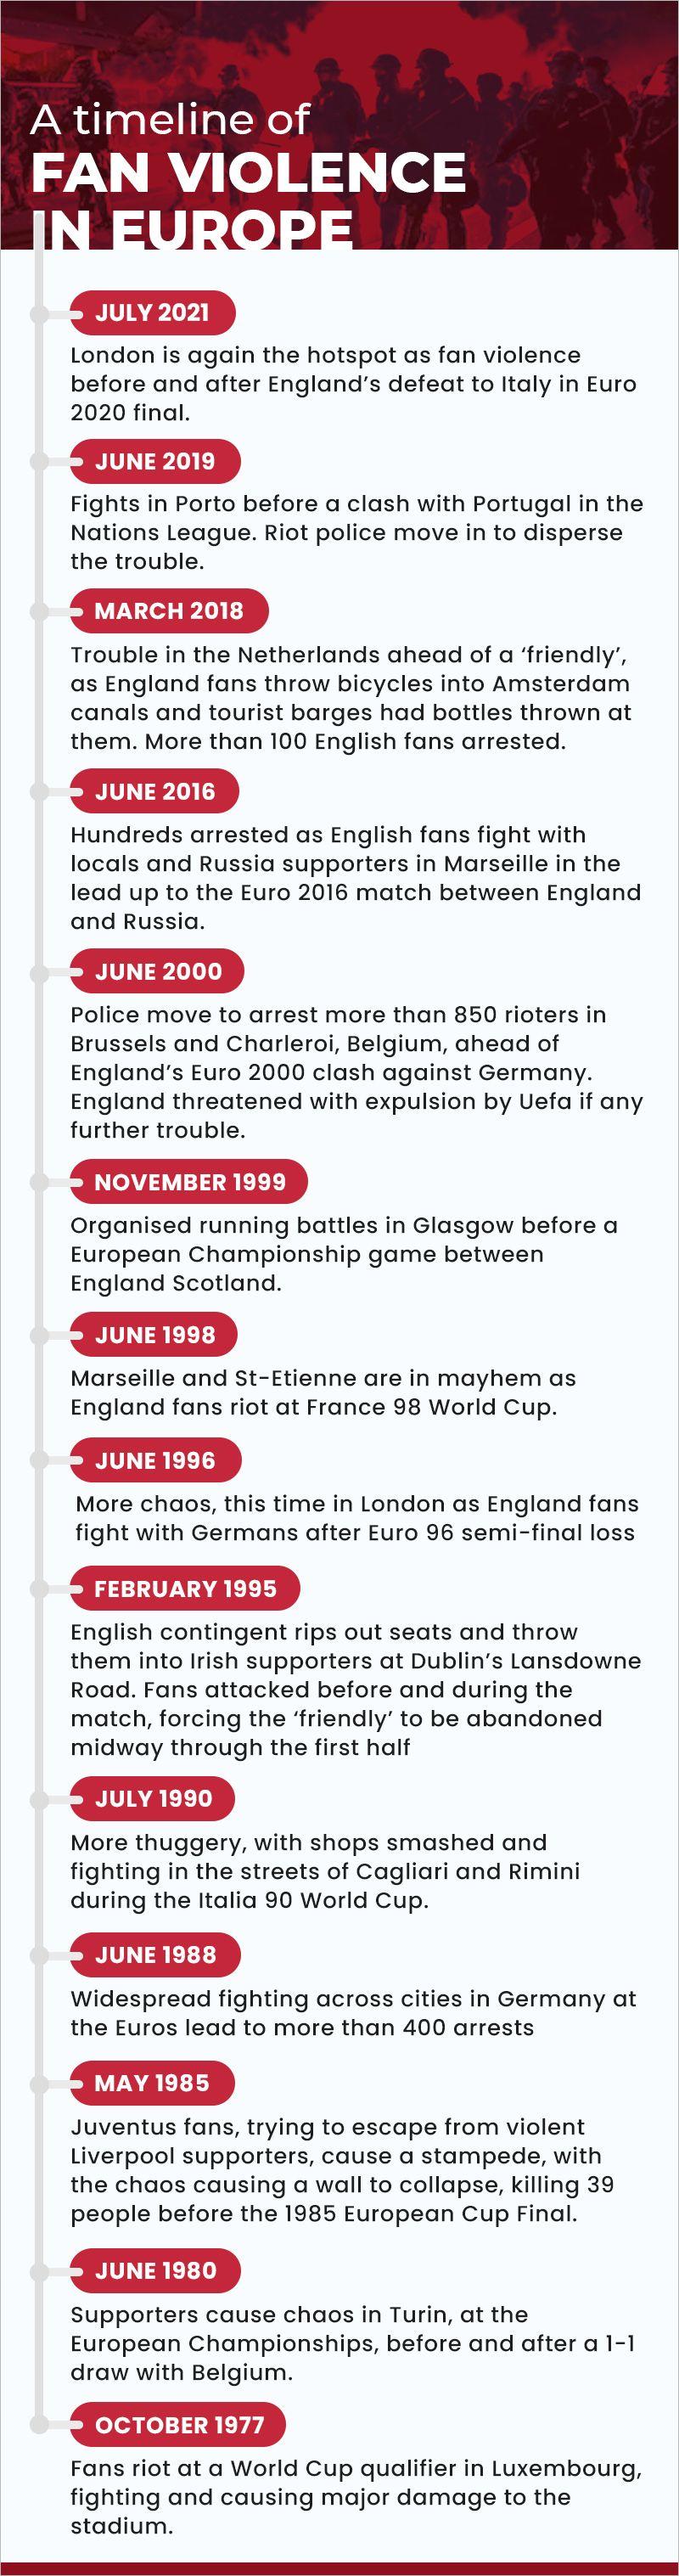 fan violence timeline